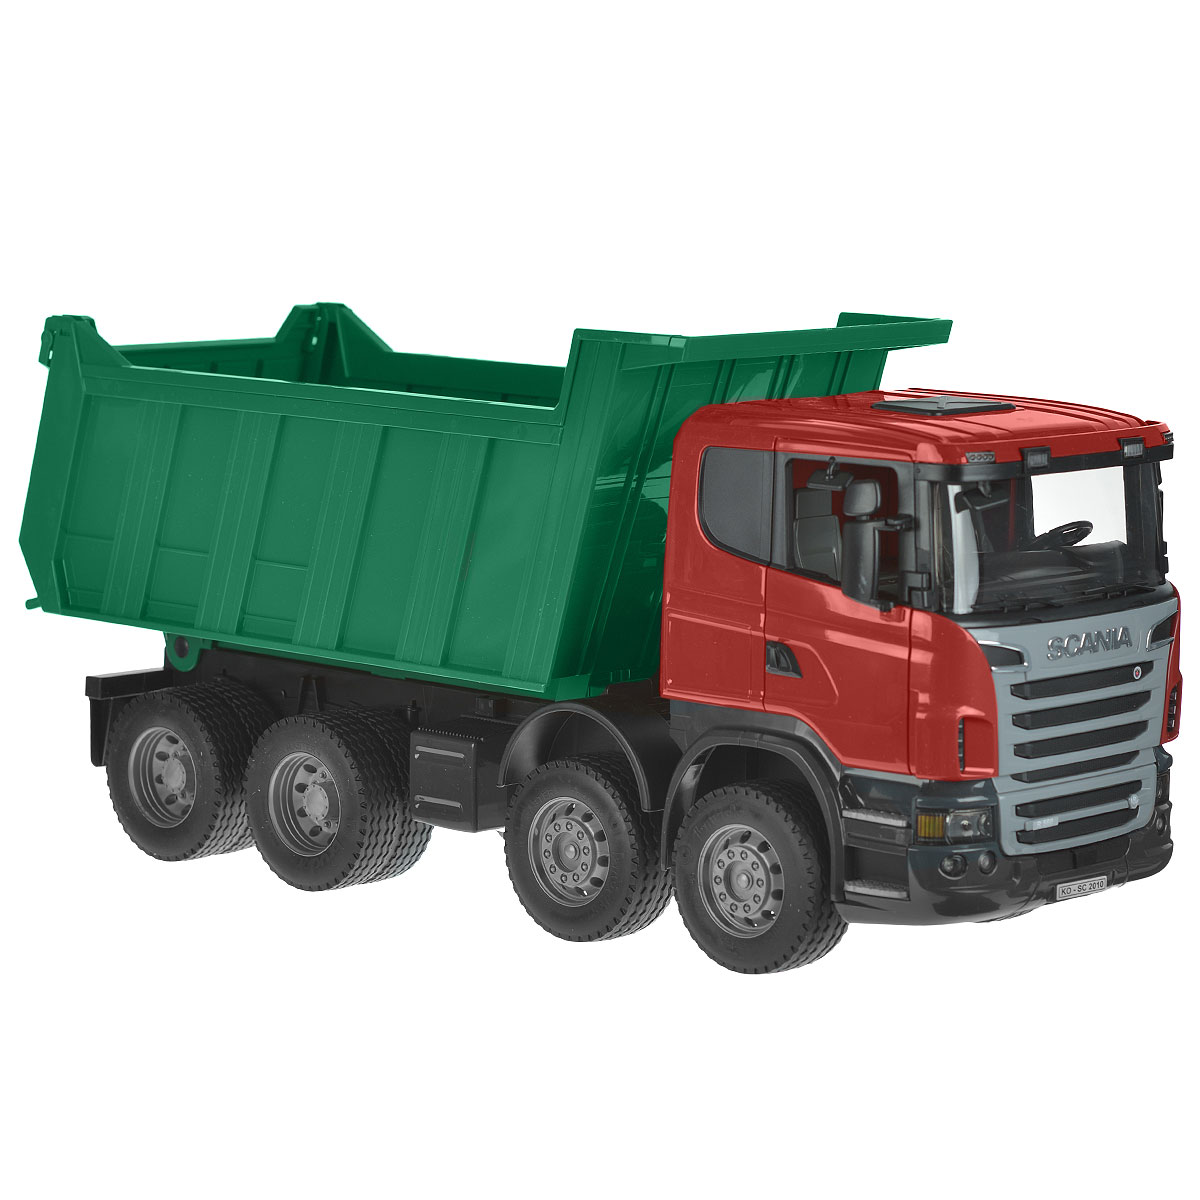 Bruder Самосвал Scania цвет зеленый красный bruder самосвал scania с 3 лет